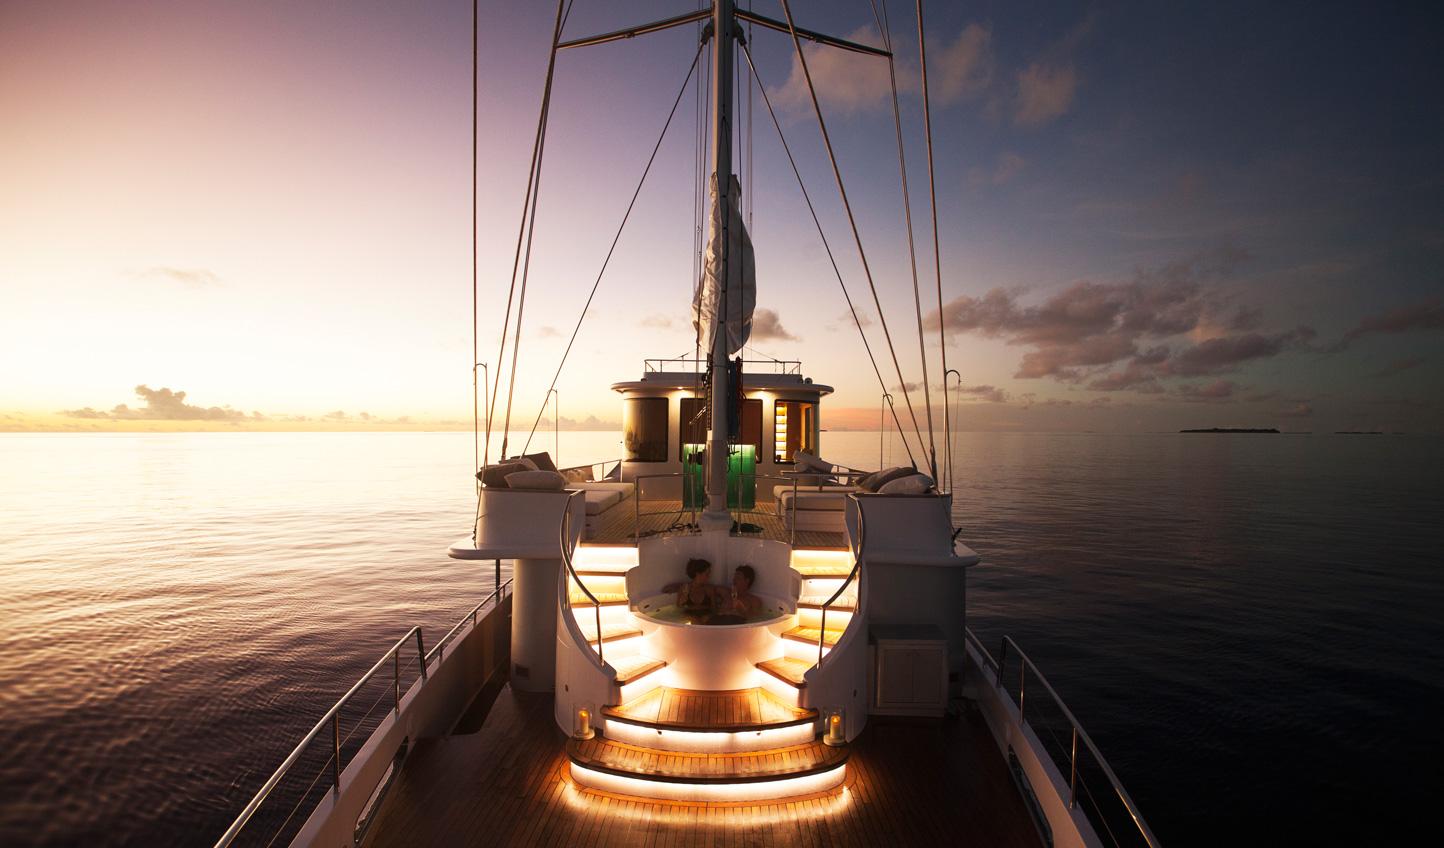 Soak away in the jacuzzi on board Soneva in Aqua